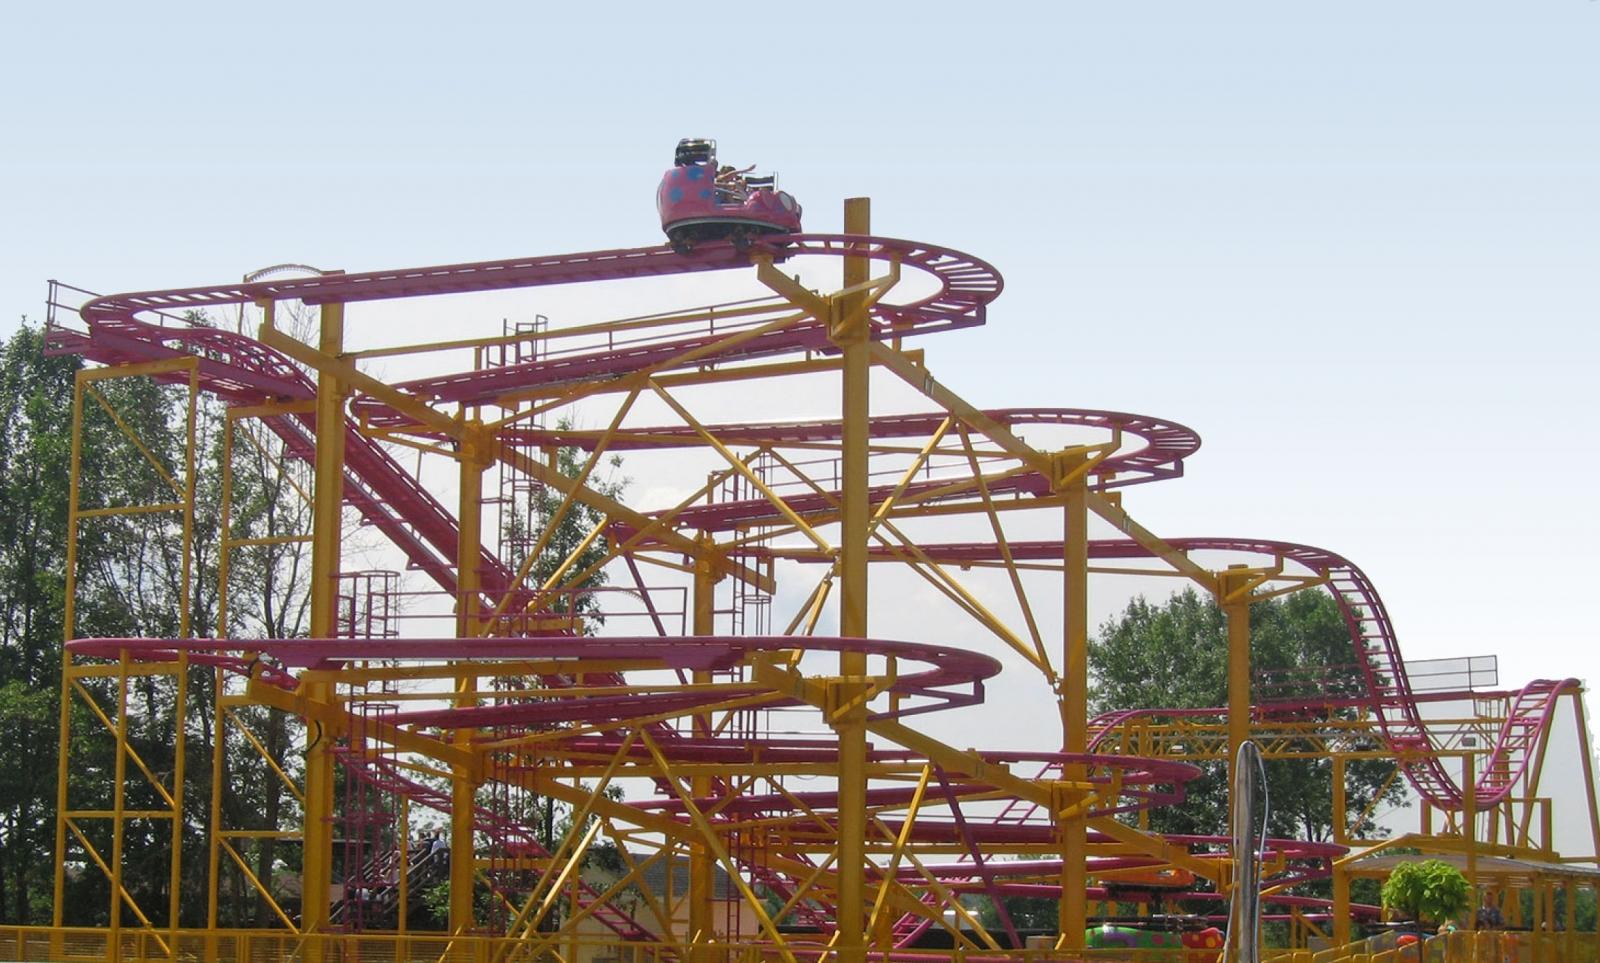 Speedy Coaster